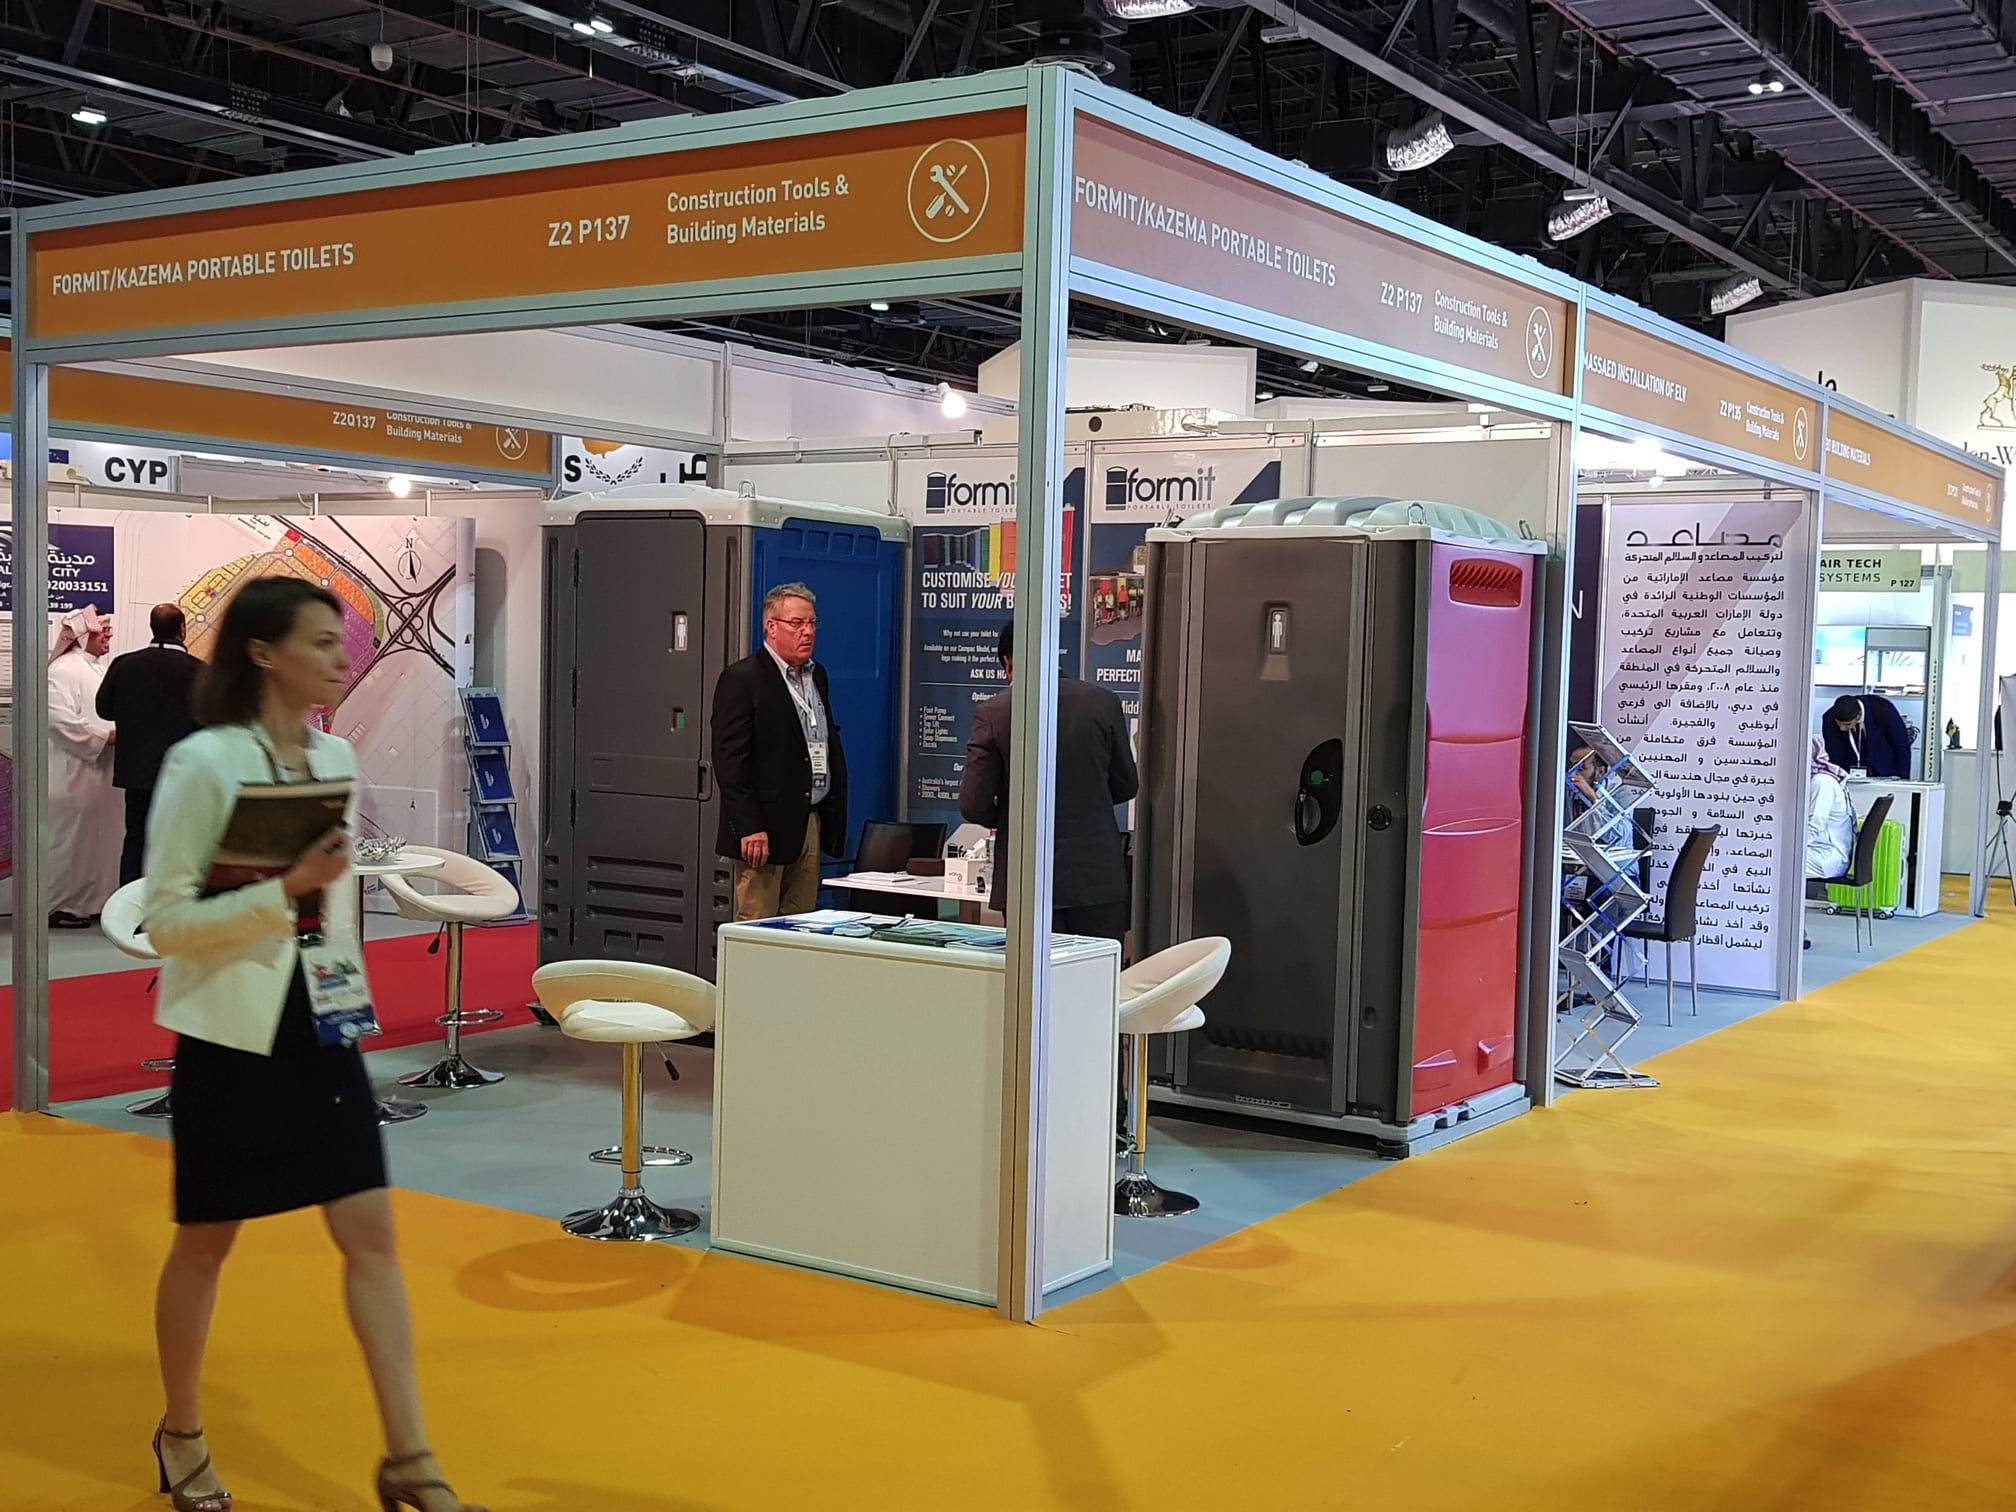 Portable Toilet Exhibition : Kazema portable toilets participating in the big 5 expo kazema